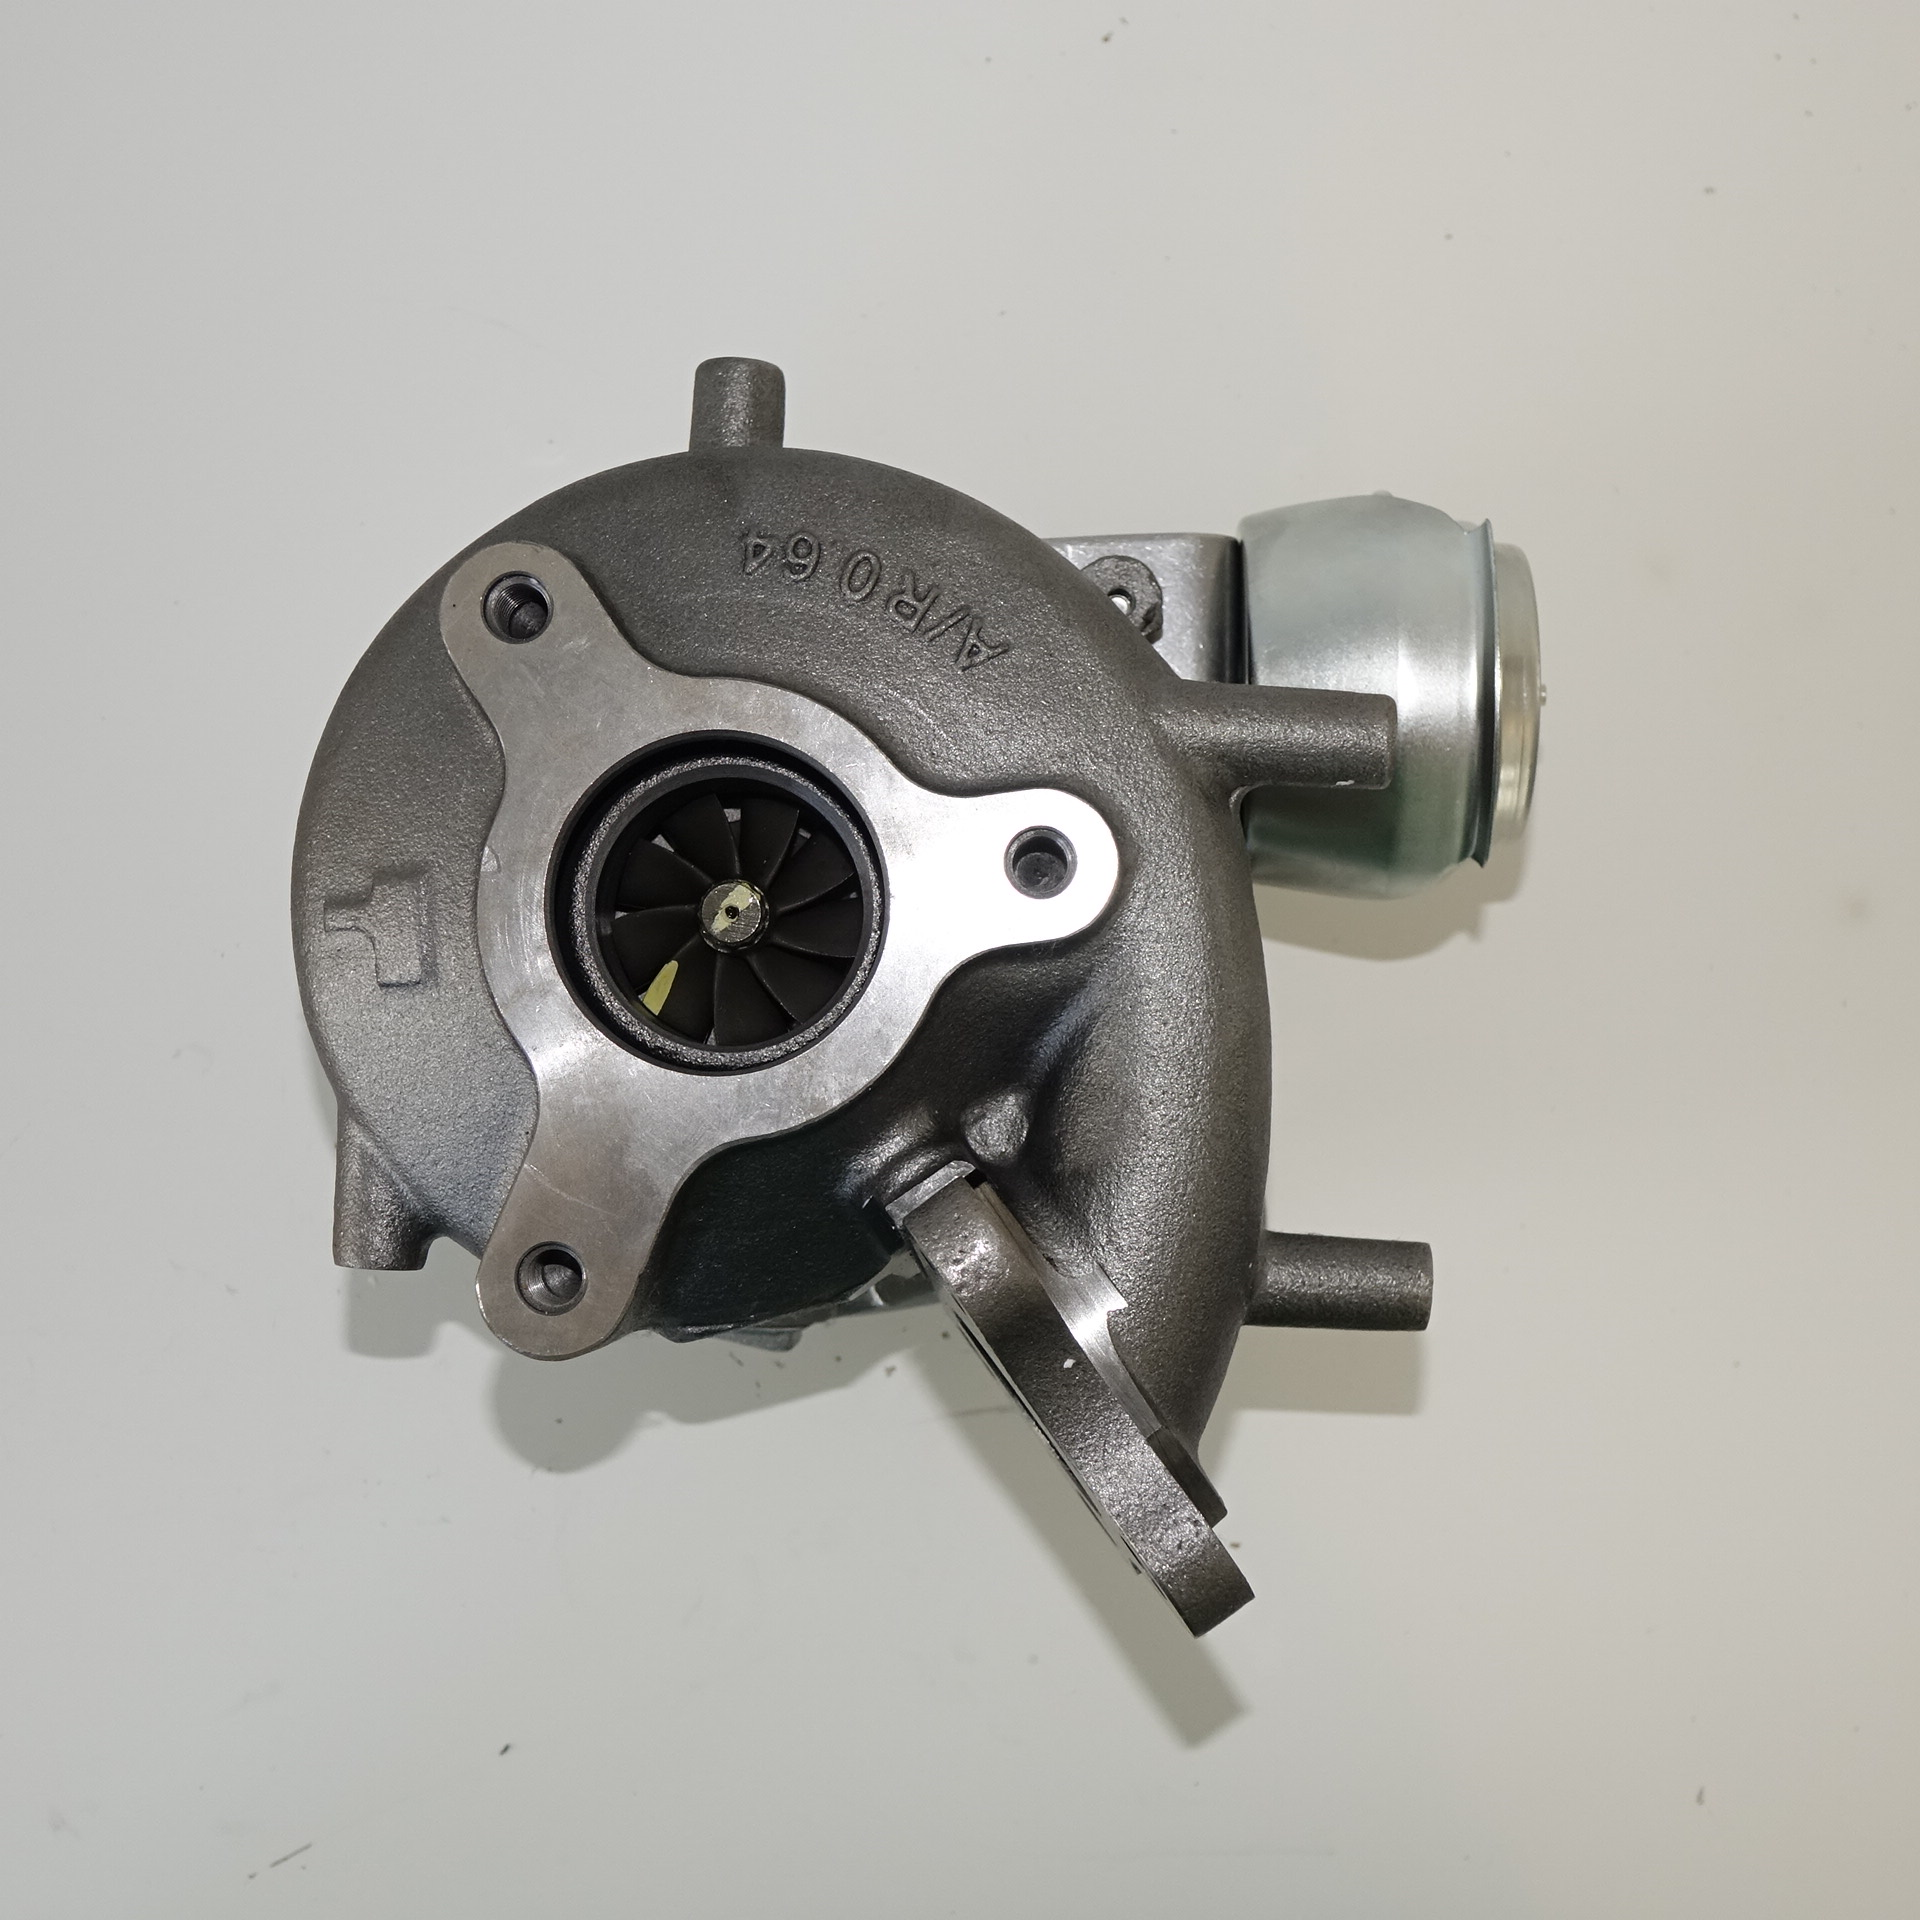 nissan-navarra-d40-turbocharger-gt2056v-7720-compressor-dump